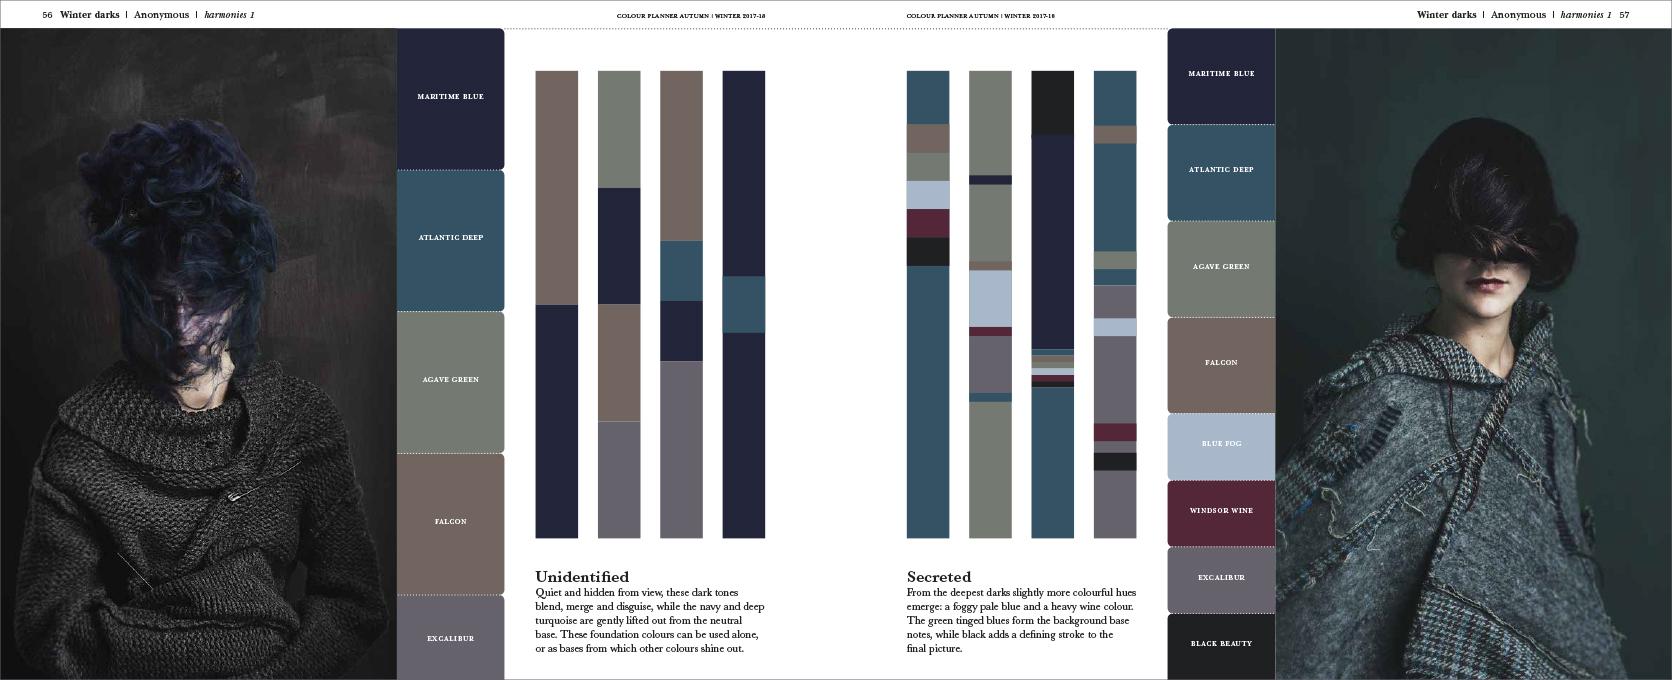 Spread PantoneView Colour Planner